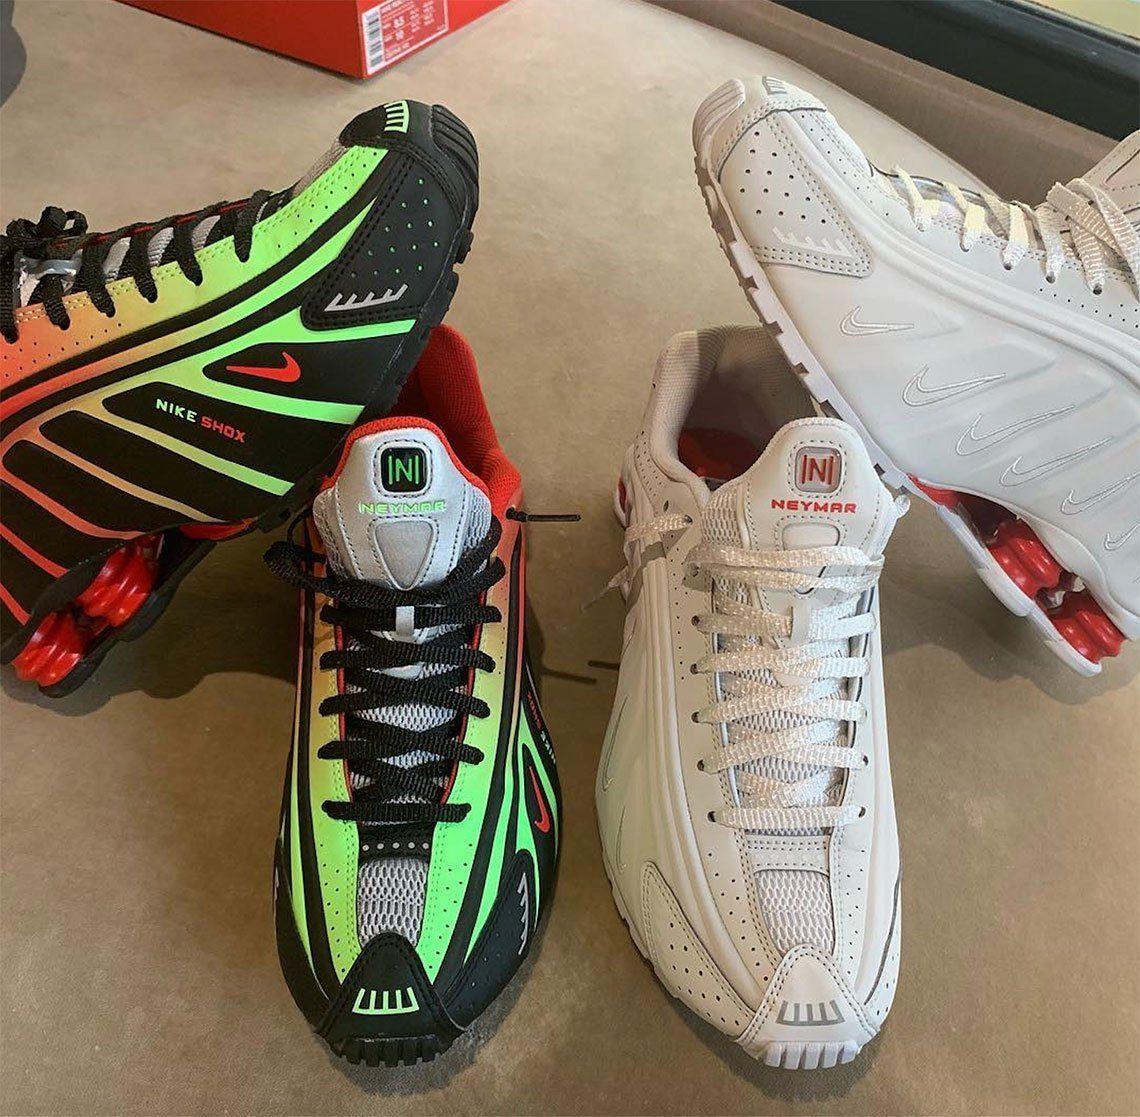 Neymar Jr. x Nike Shox R4 | Nike shox, Neymar, Neymar jr